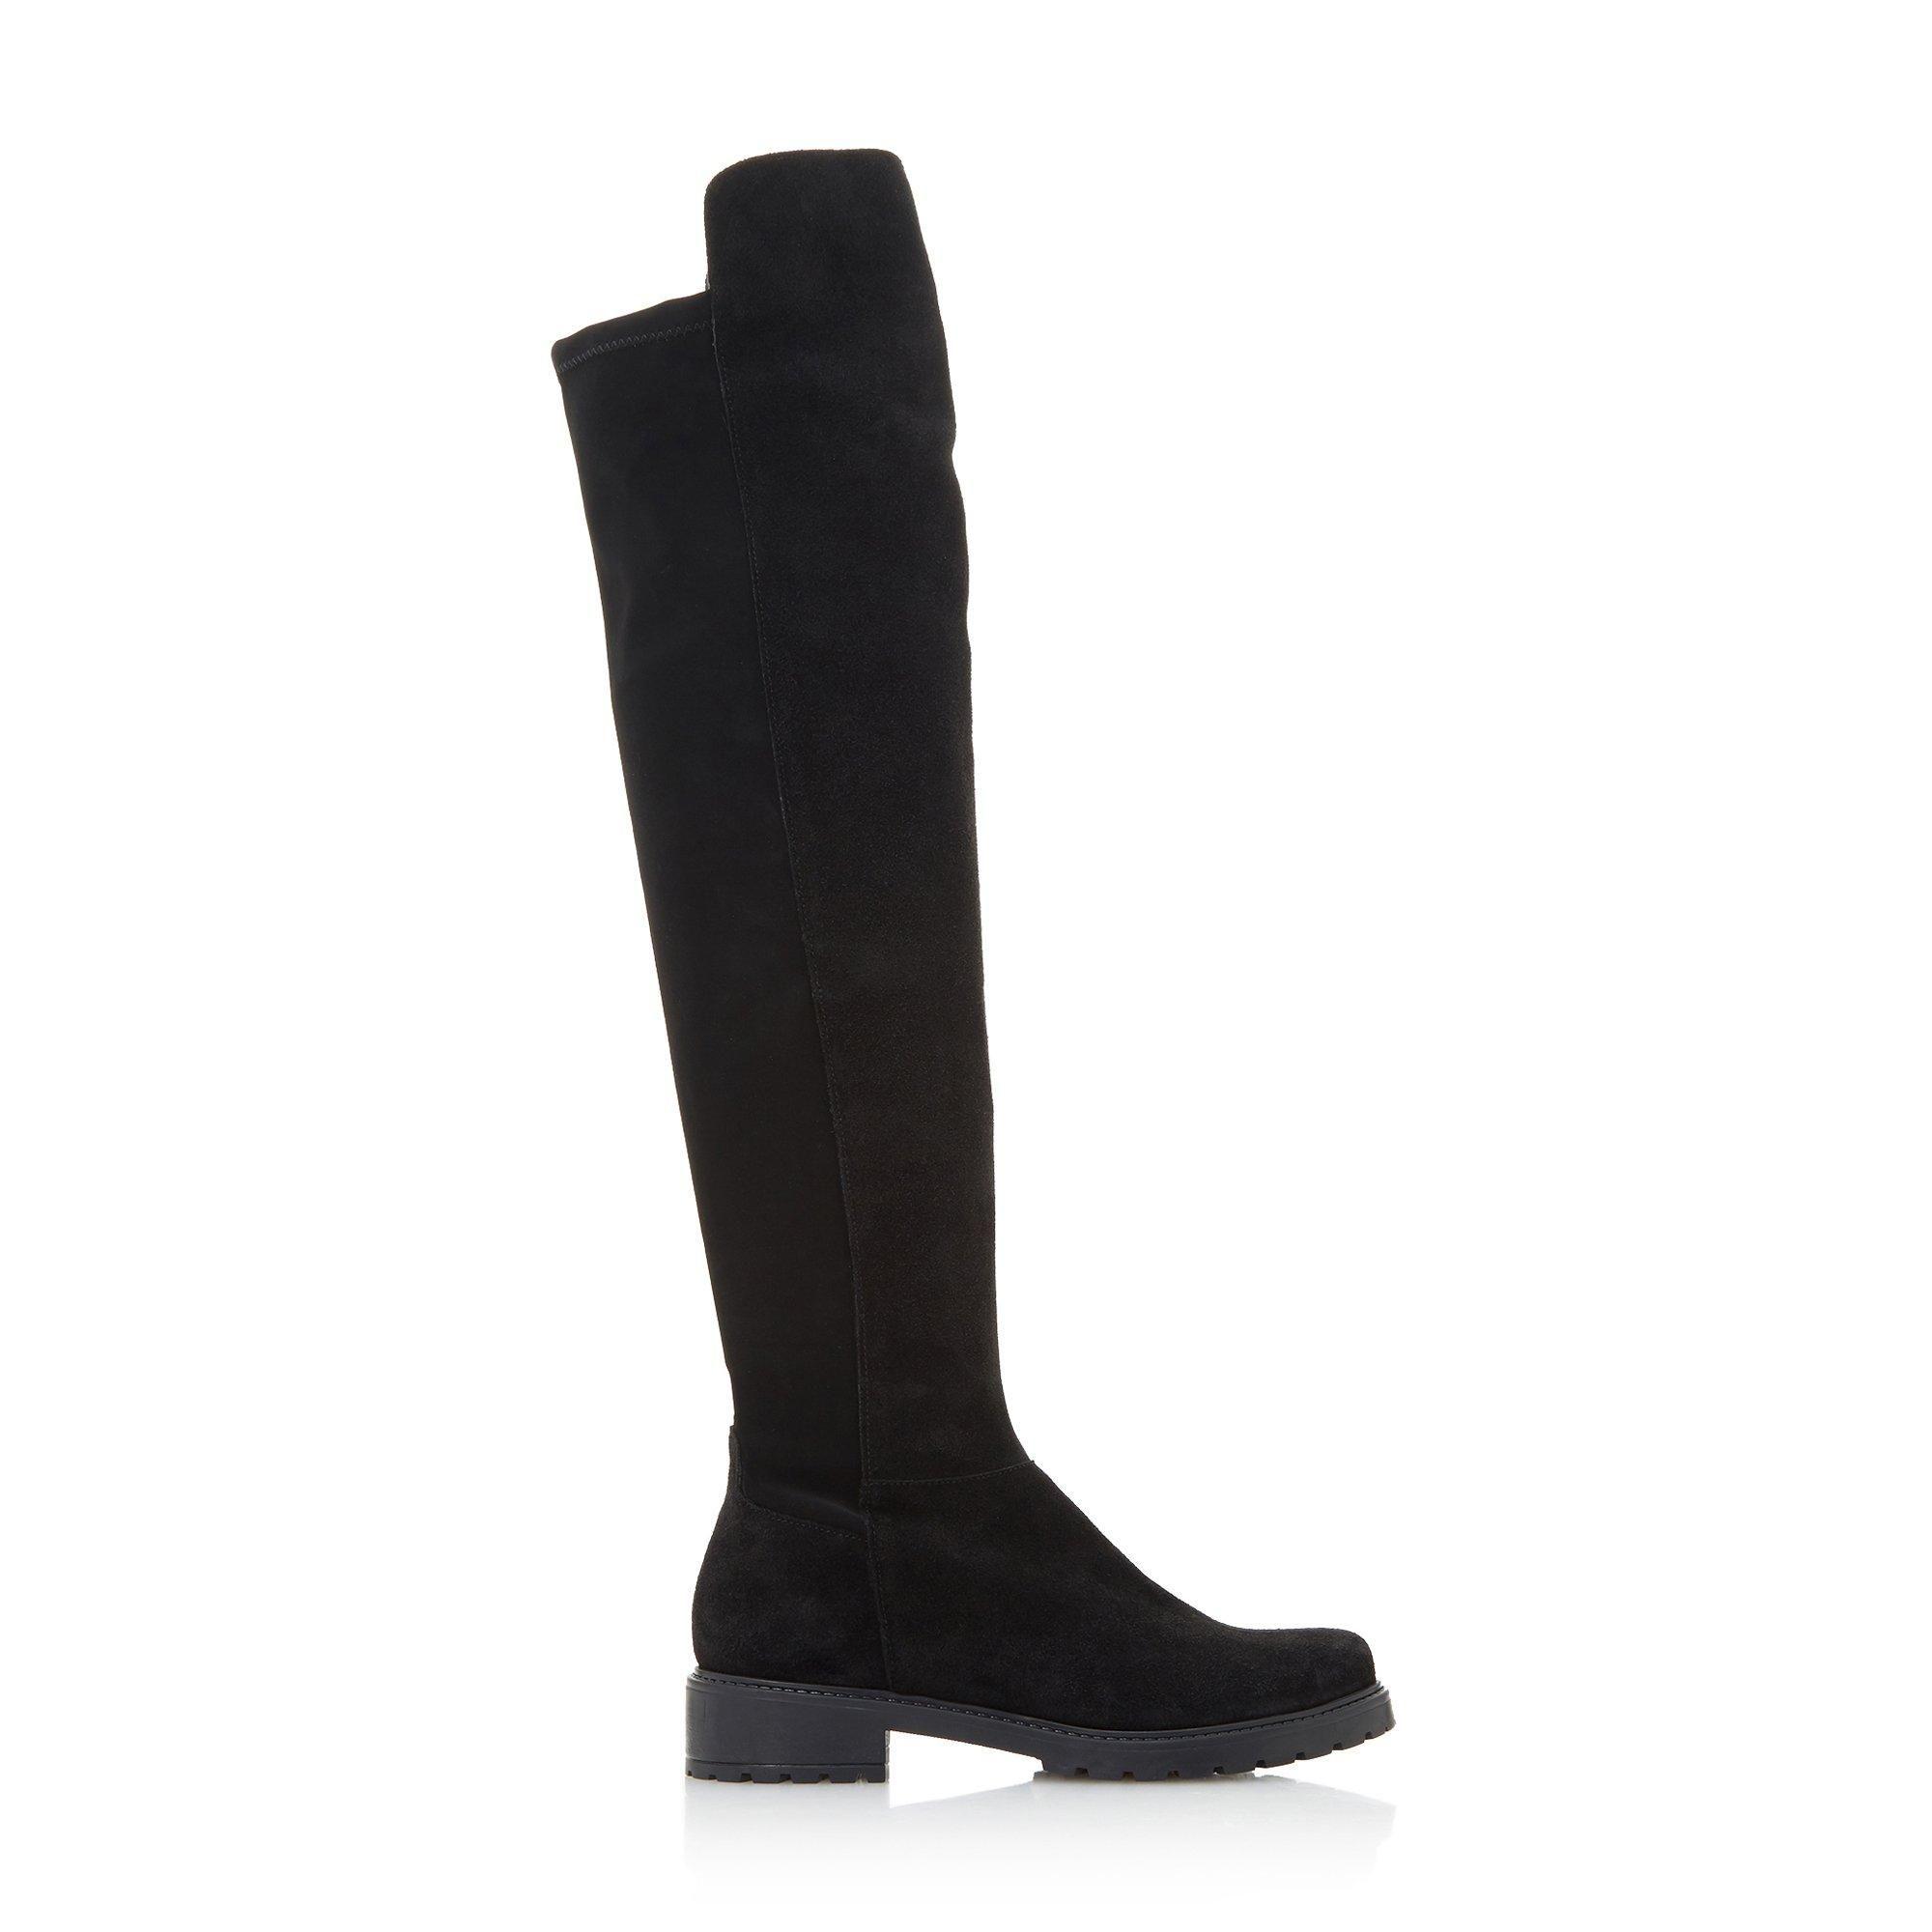 Dune Ladies TAMII Knee High Boots